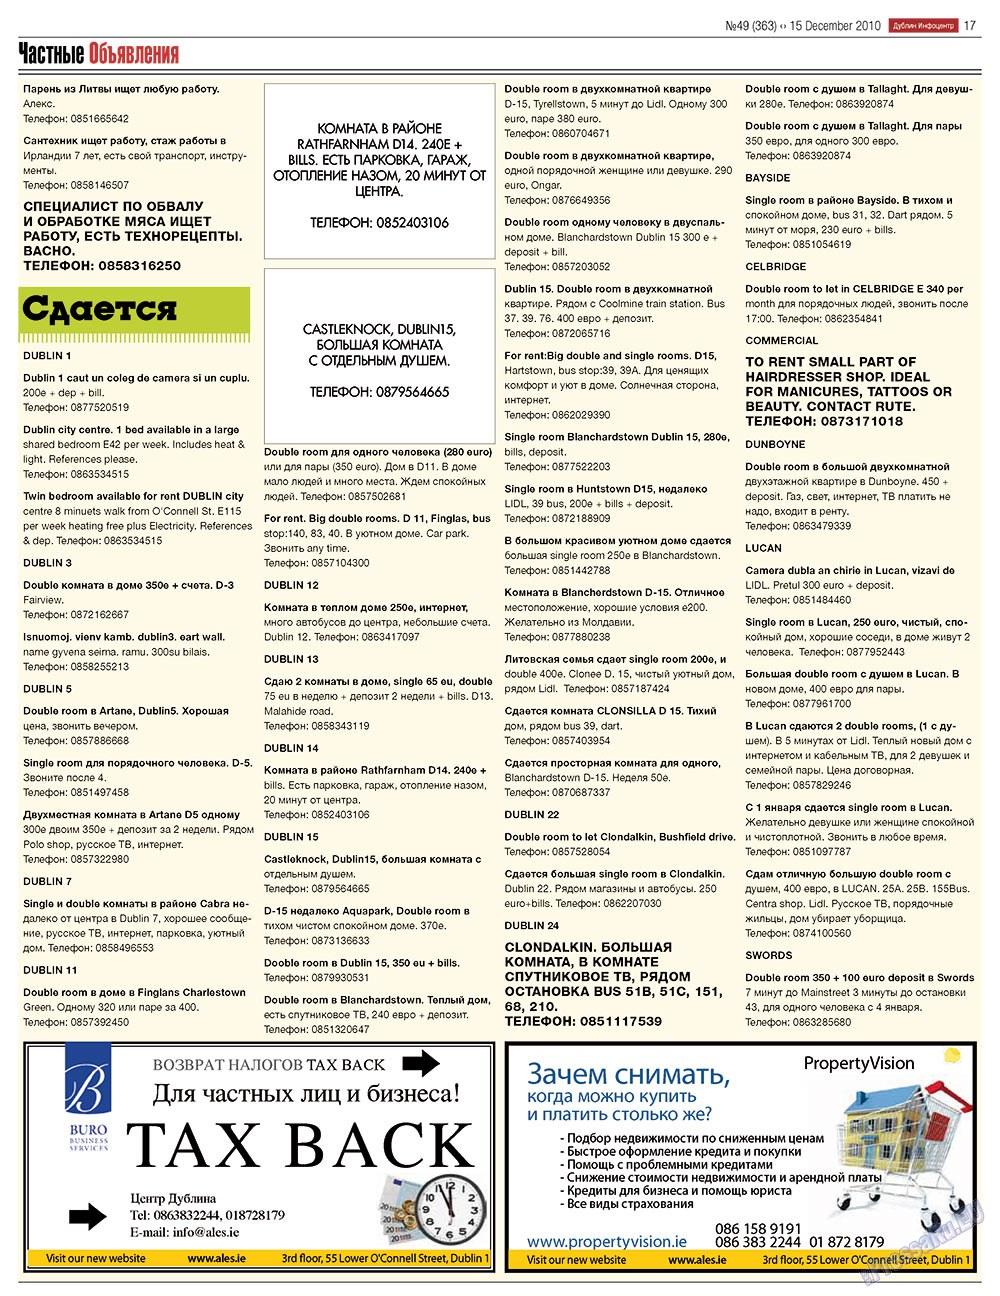 Дублин инфоцентр (газета). 2010 год, номер 49, стр. 17